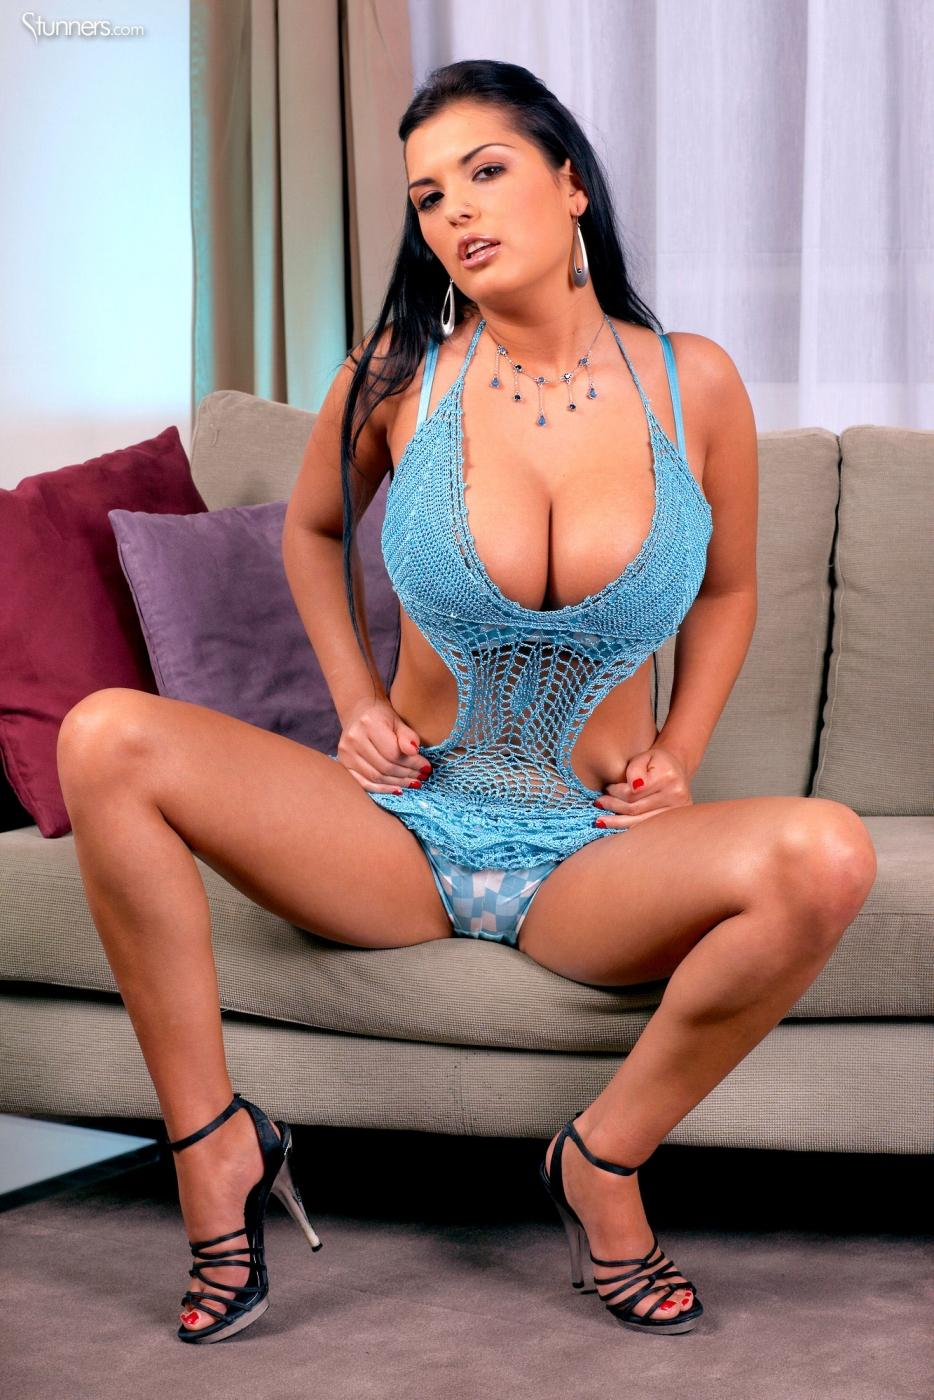 Actriz Porno Aric Dark jasmine black wiki & bio - pornographic actress